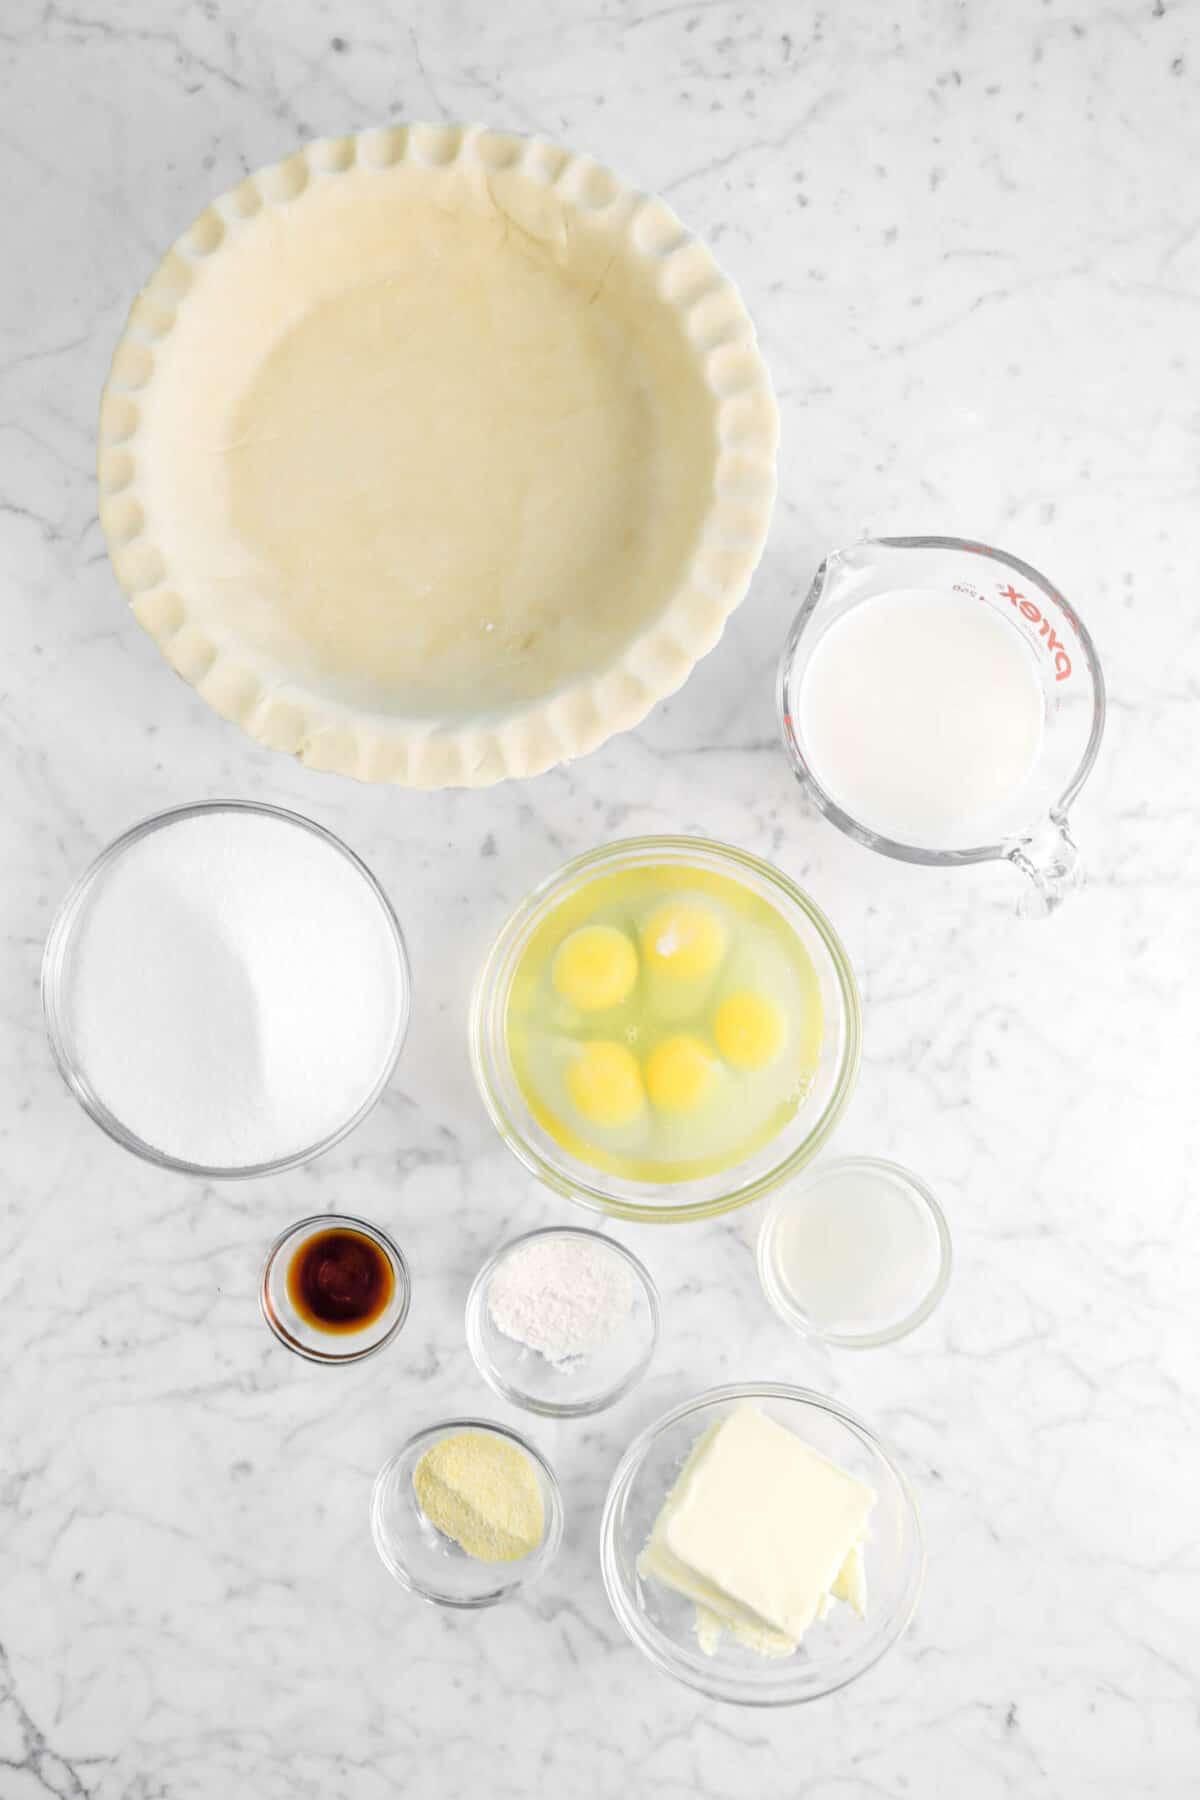 pie crust, milk, eggs, sugar, vanilla, flour, lemon juice, cornmeal, and butter on a marble counter